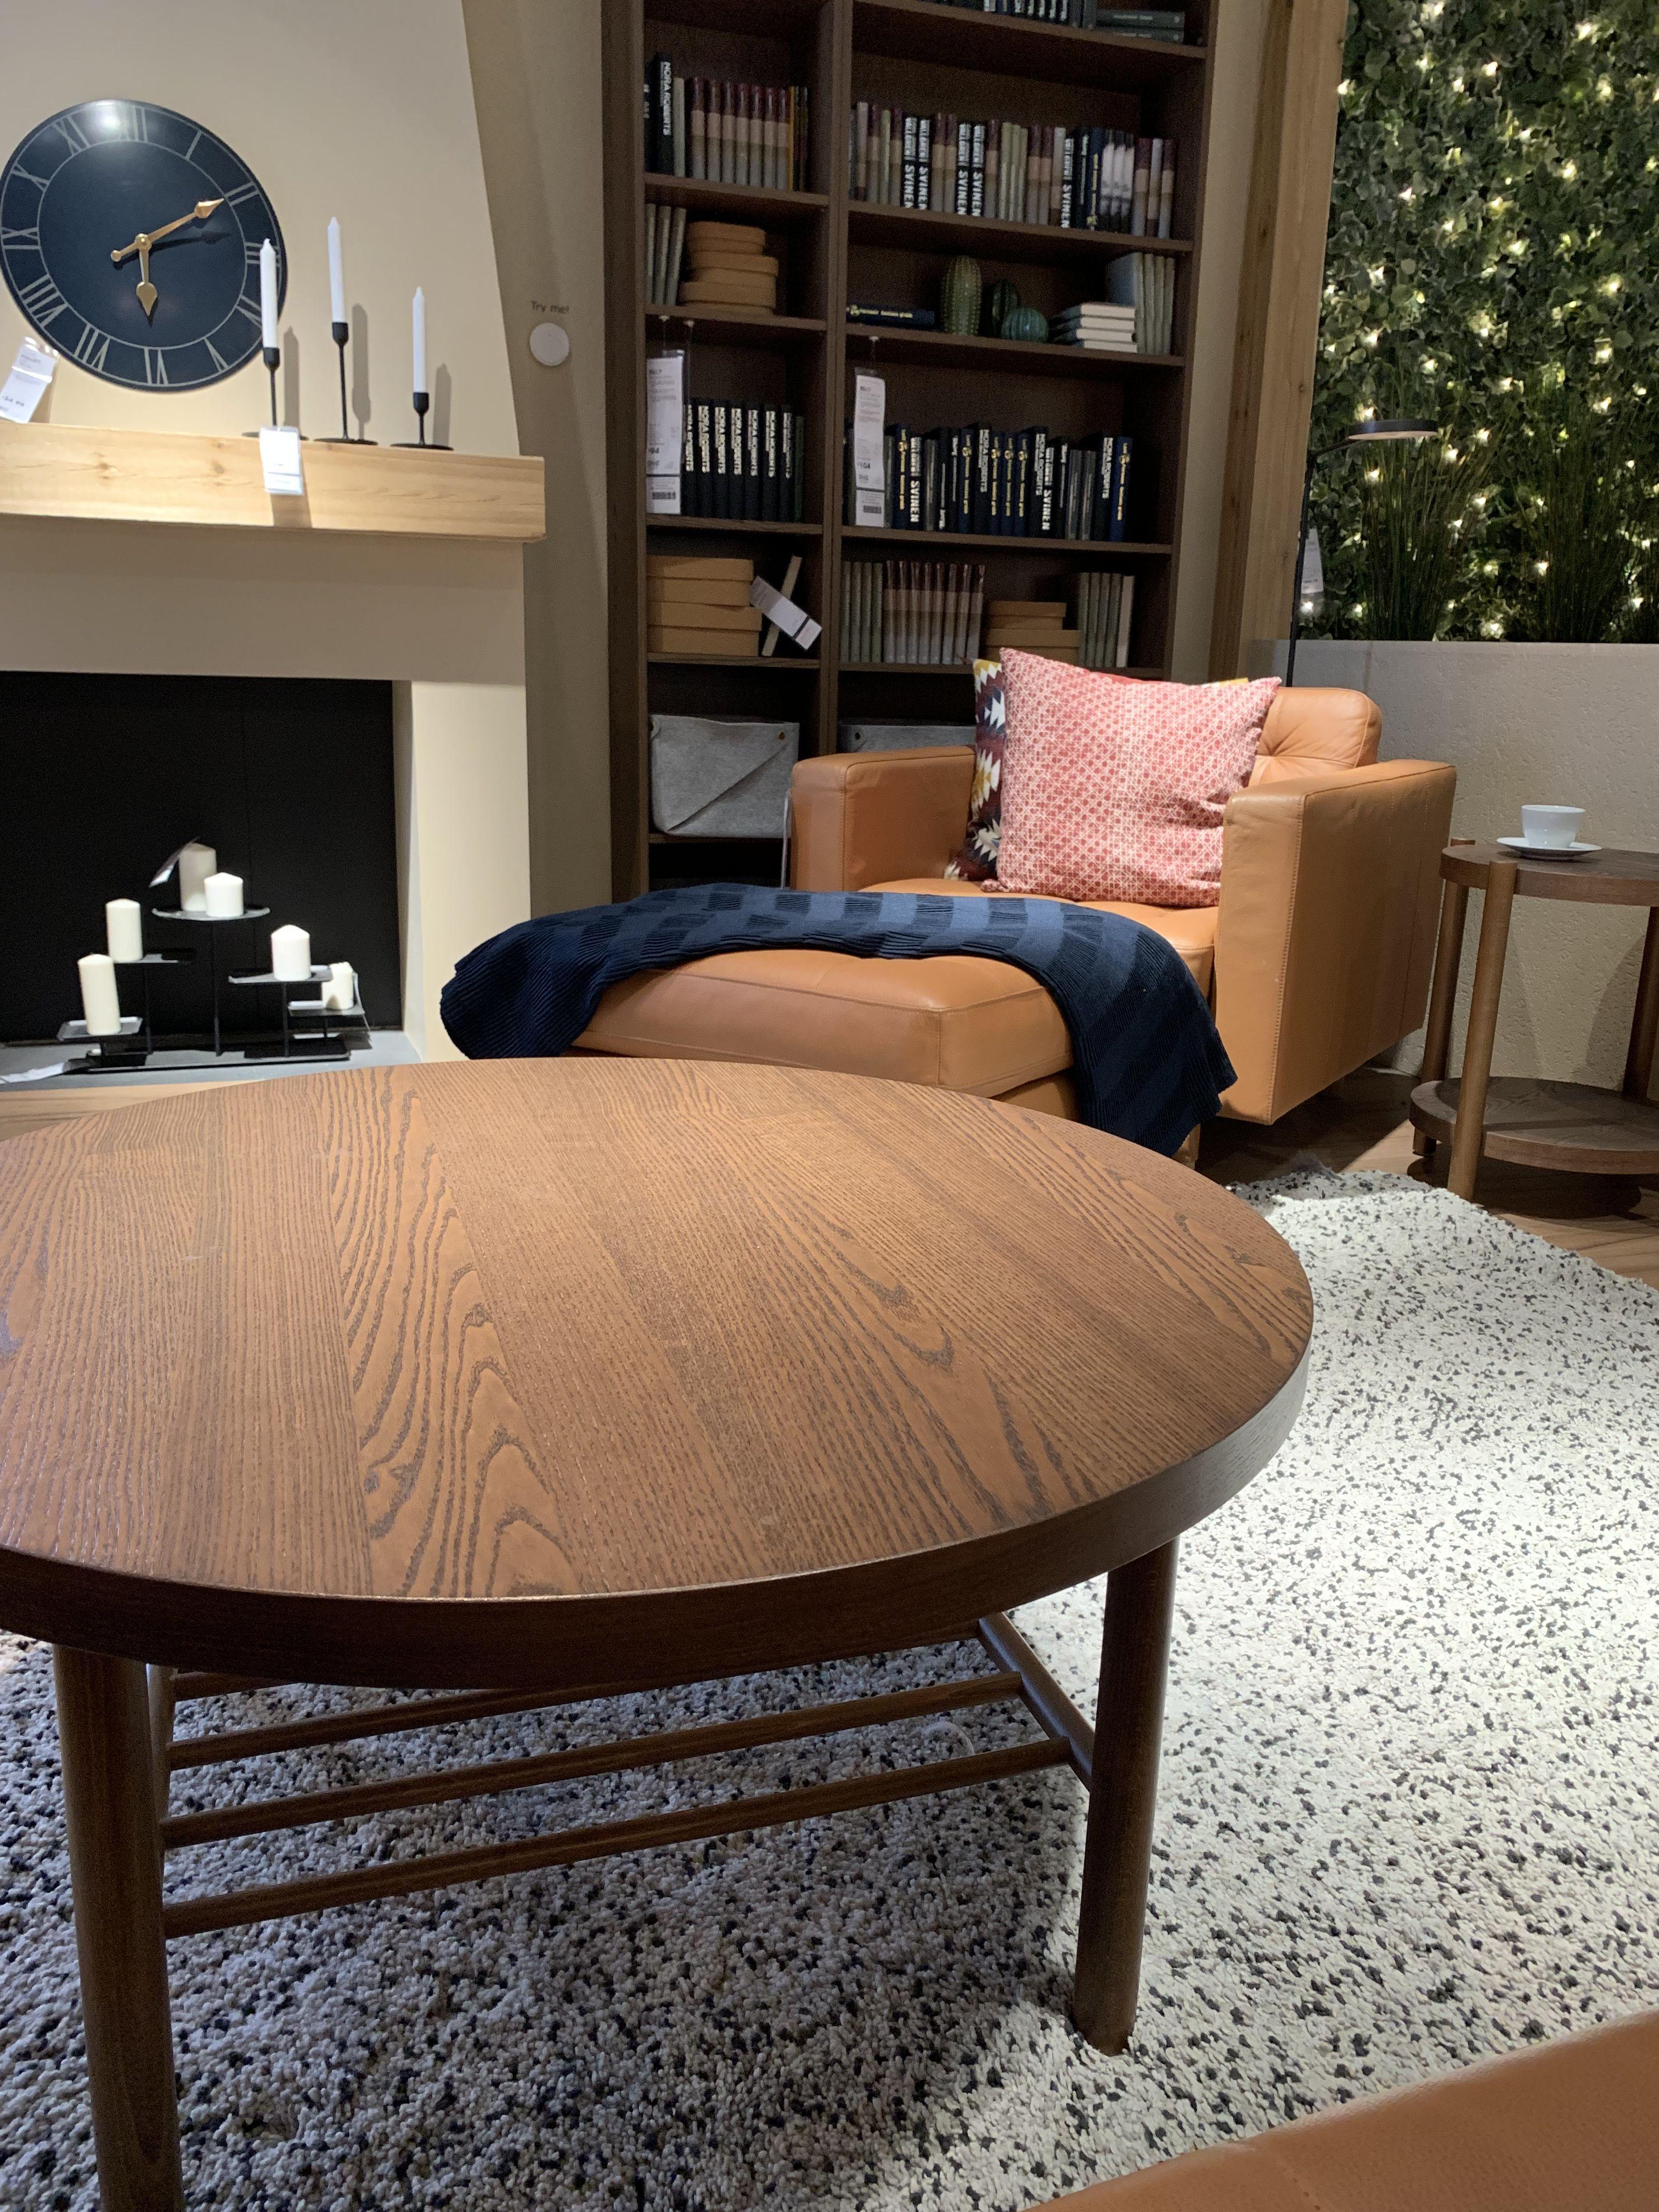 ikea coffee table  ikea coffee table coffee table